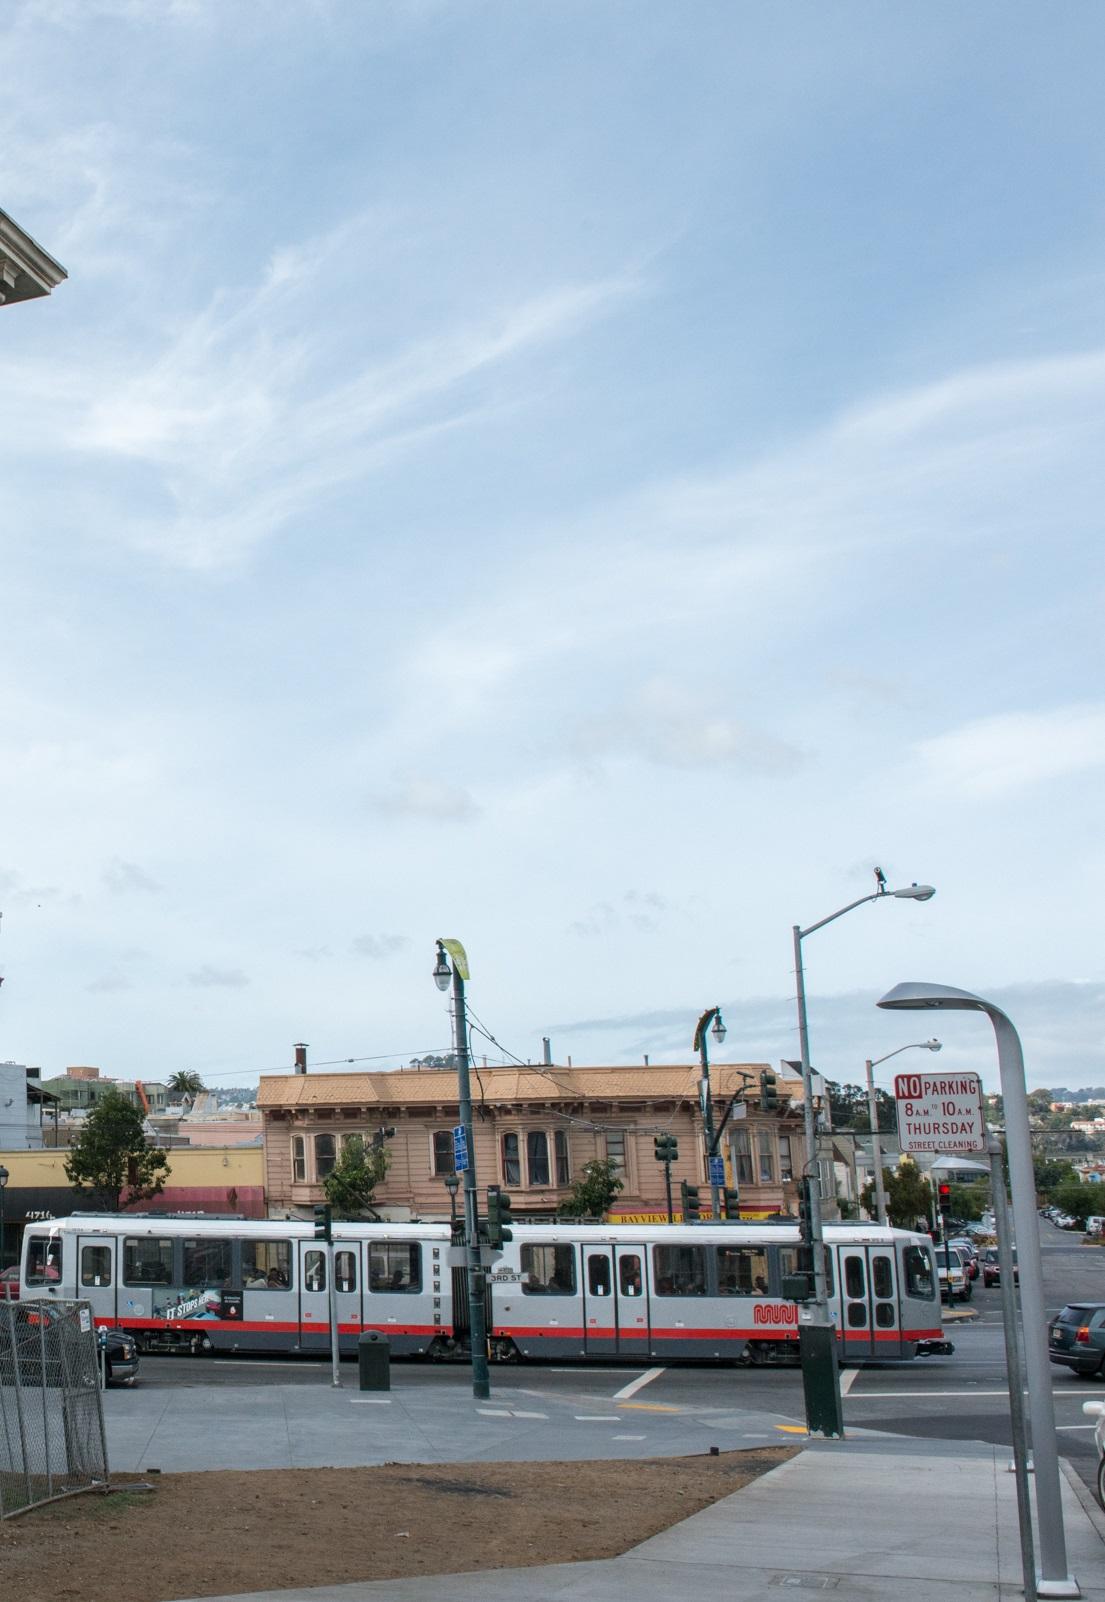 The T-Third Street MUNI light-rail runs nearby.